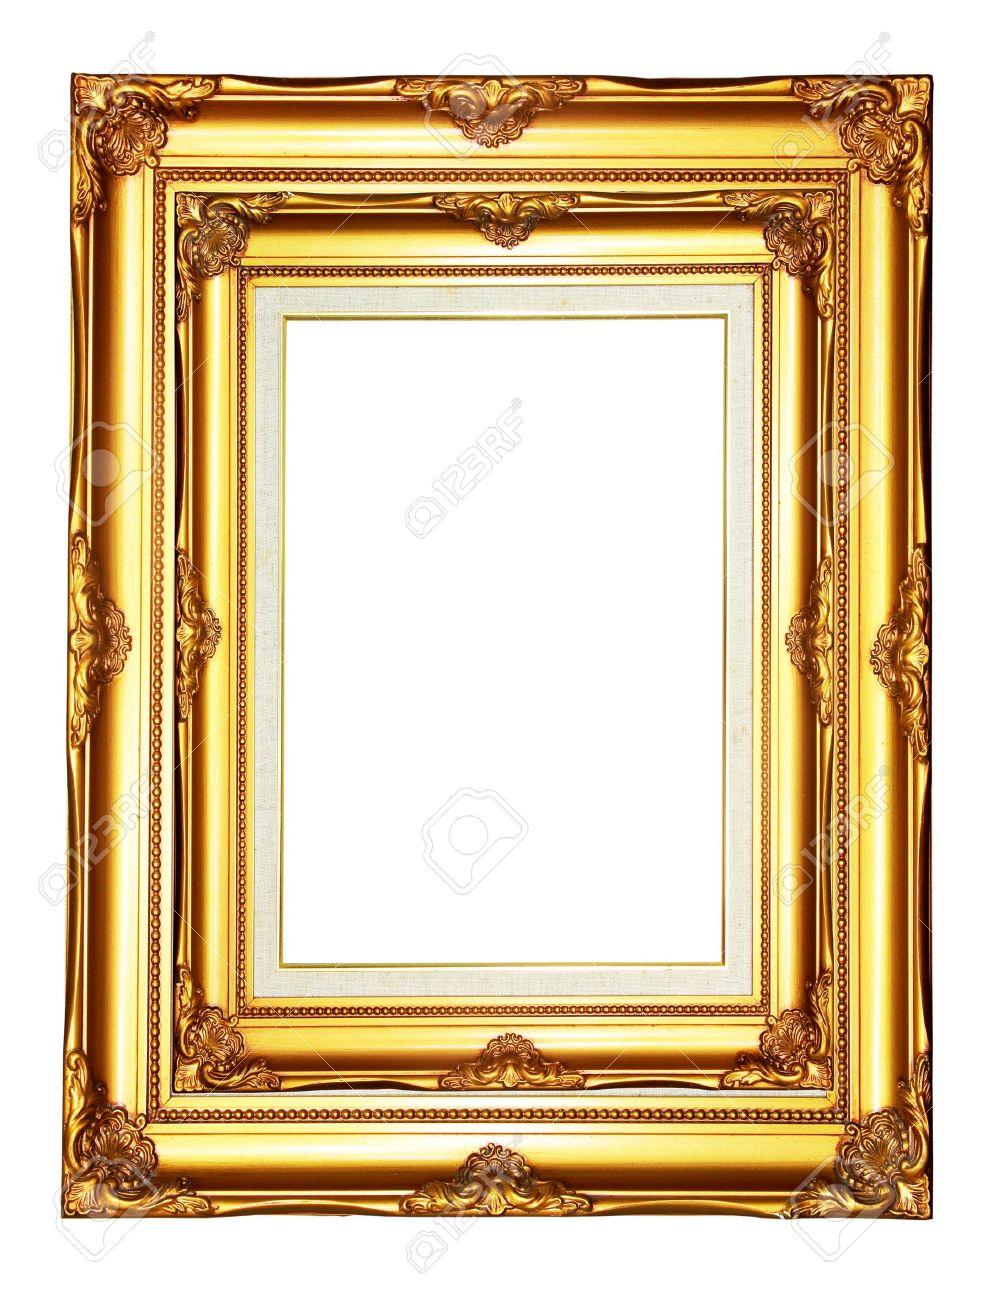 Vintage gold wood photo frame on white background stock photo vintage gold wood photo frame on white background stock photo 11802633 jeuxipadfo Gallery